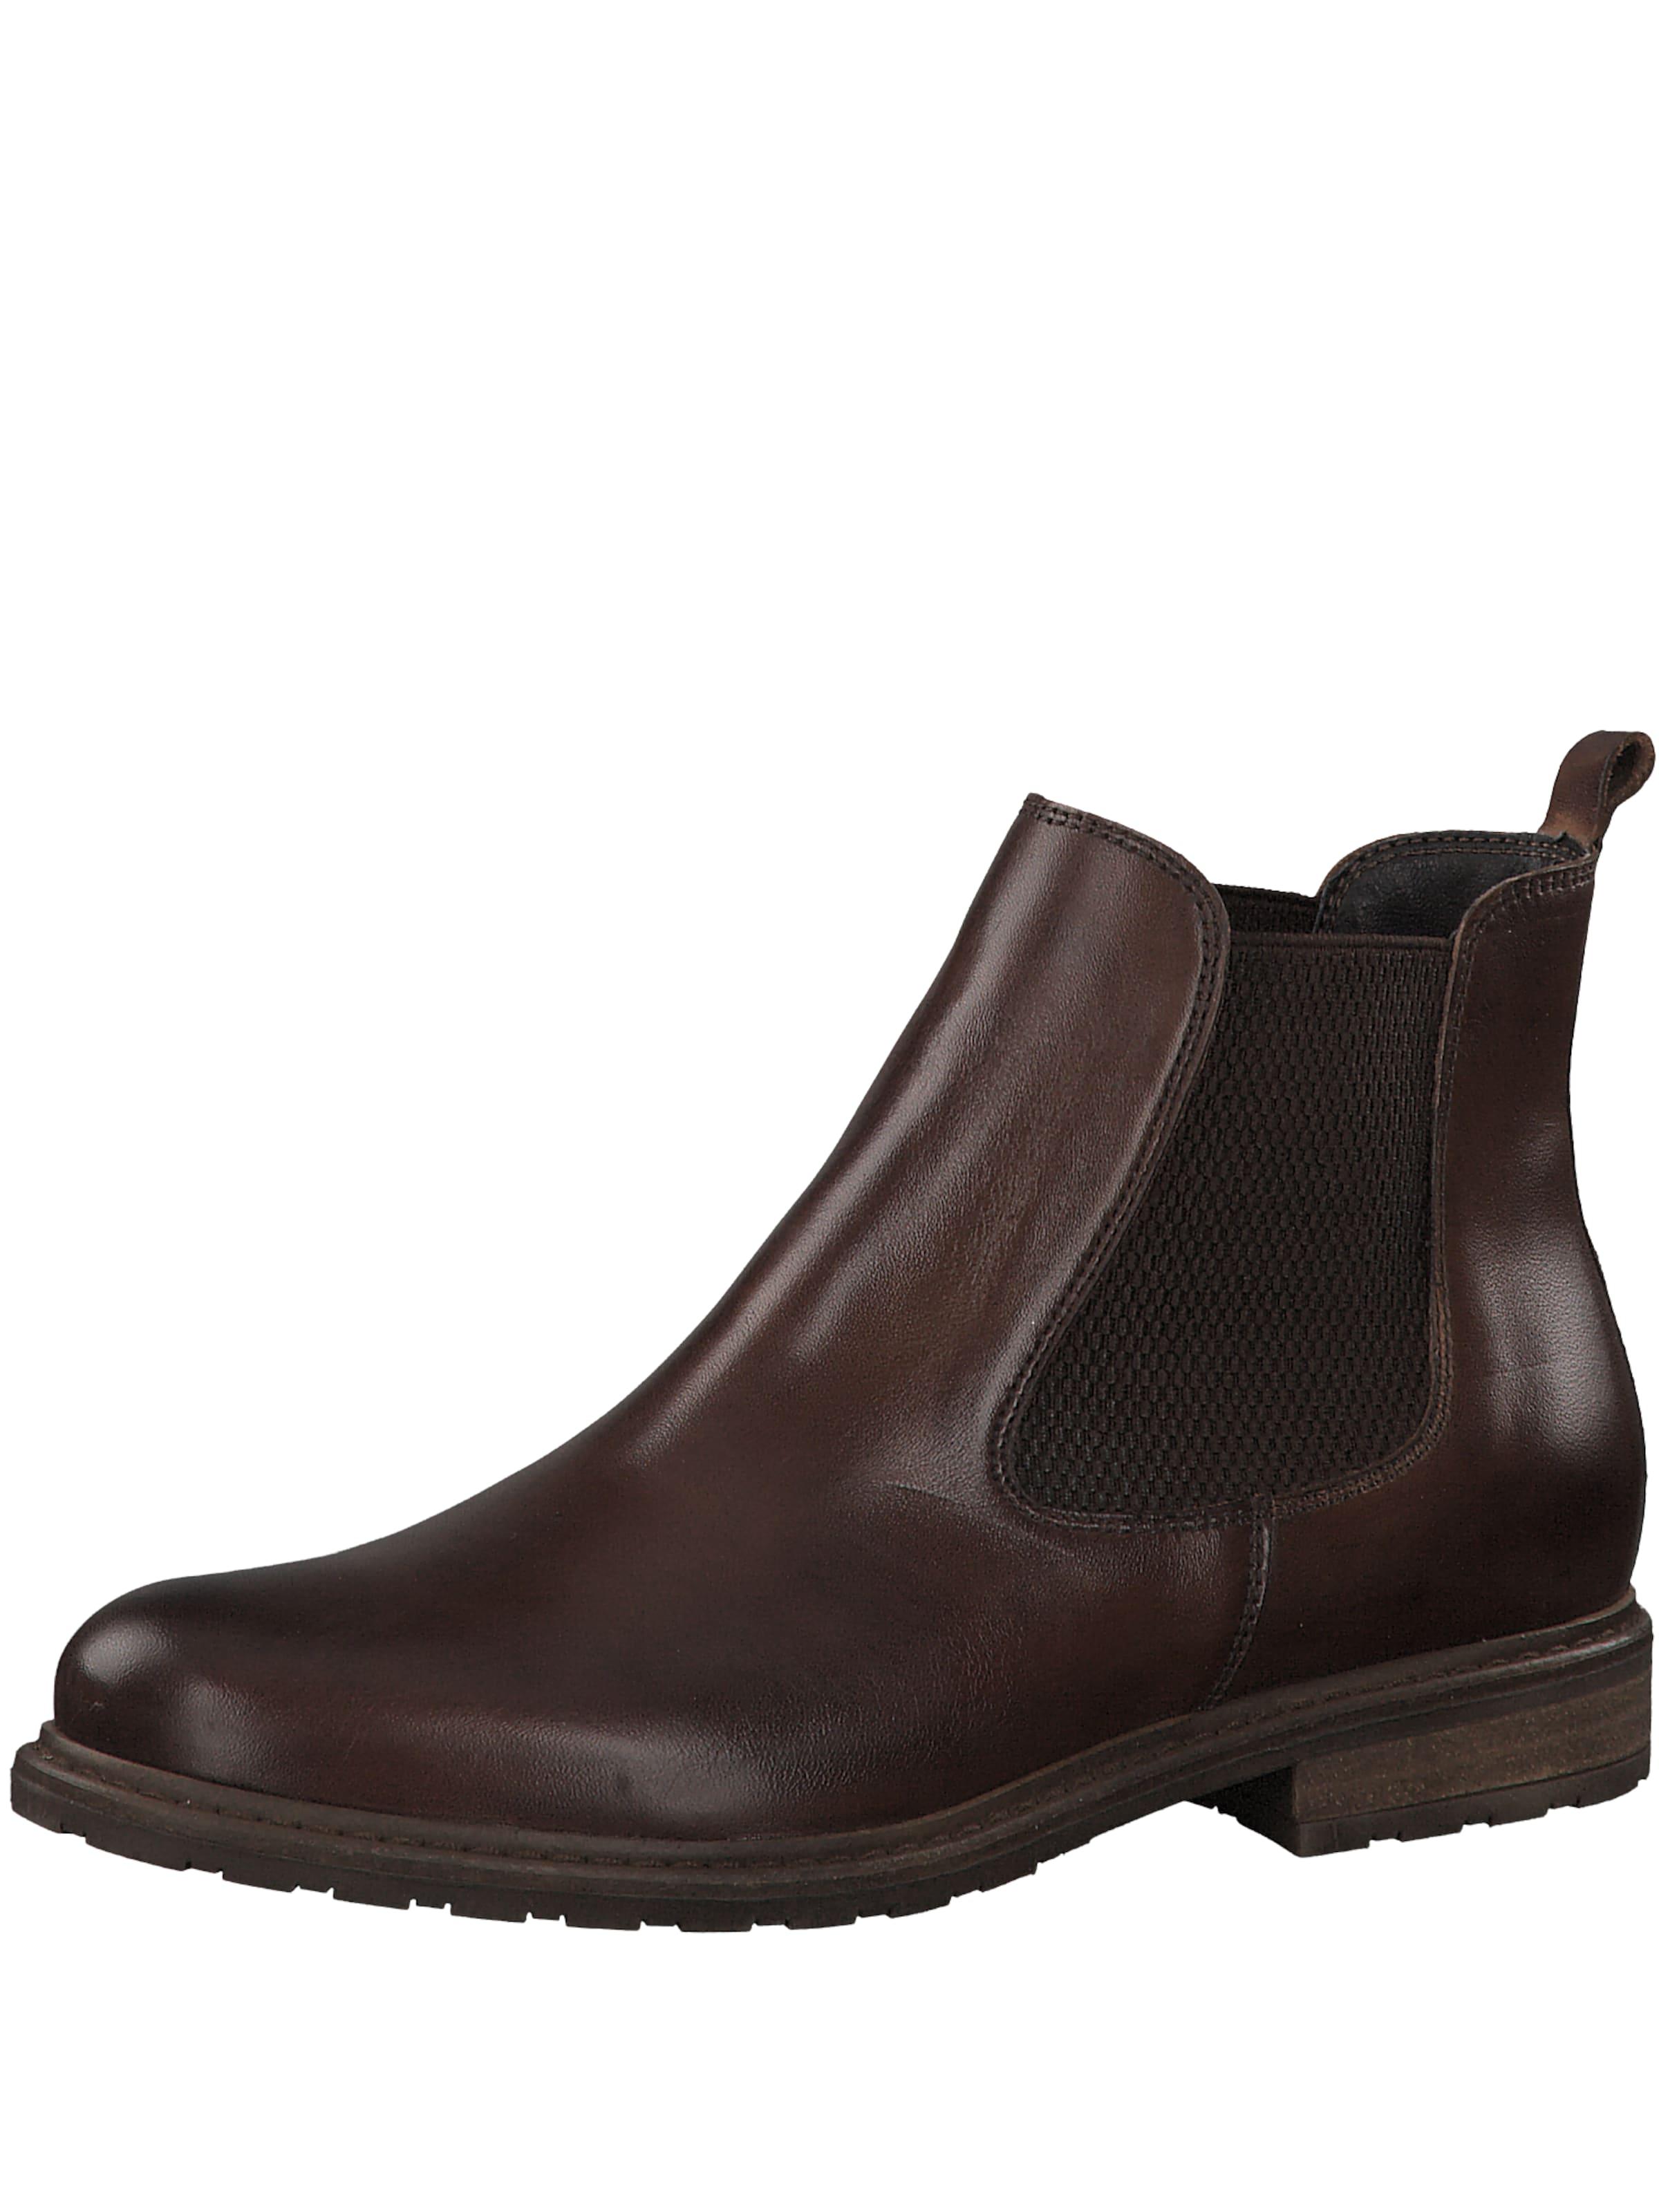 En Tamaris Chelsea Tamaris Marron Boots tCsQrdh